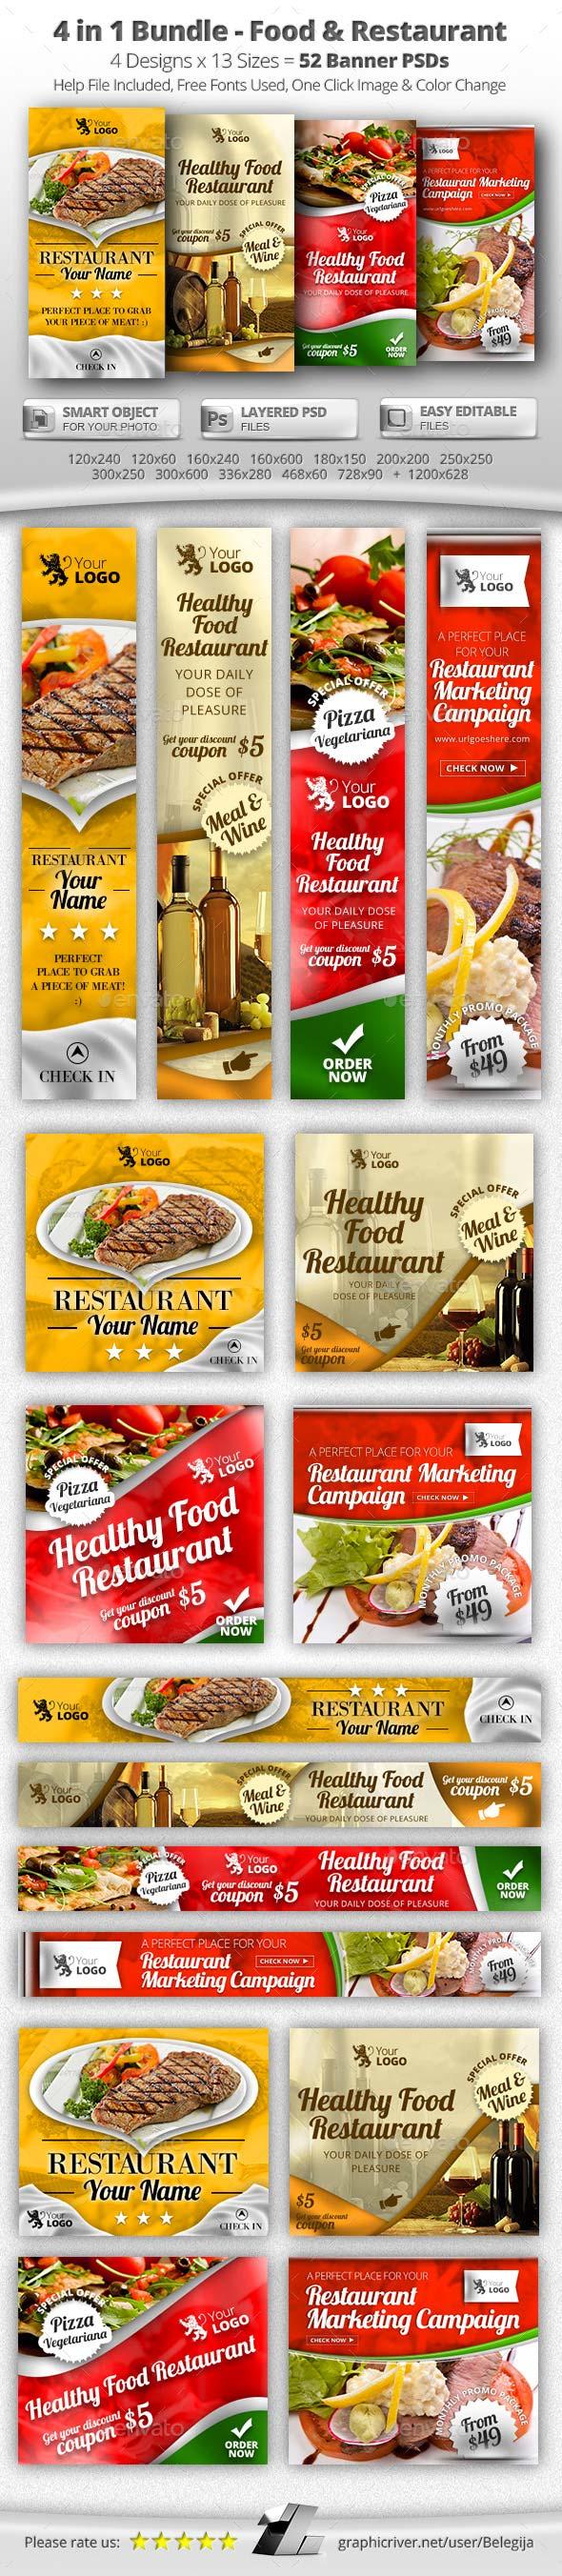 50 banners para restaurantes